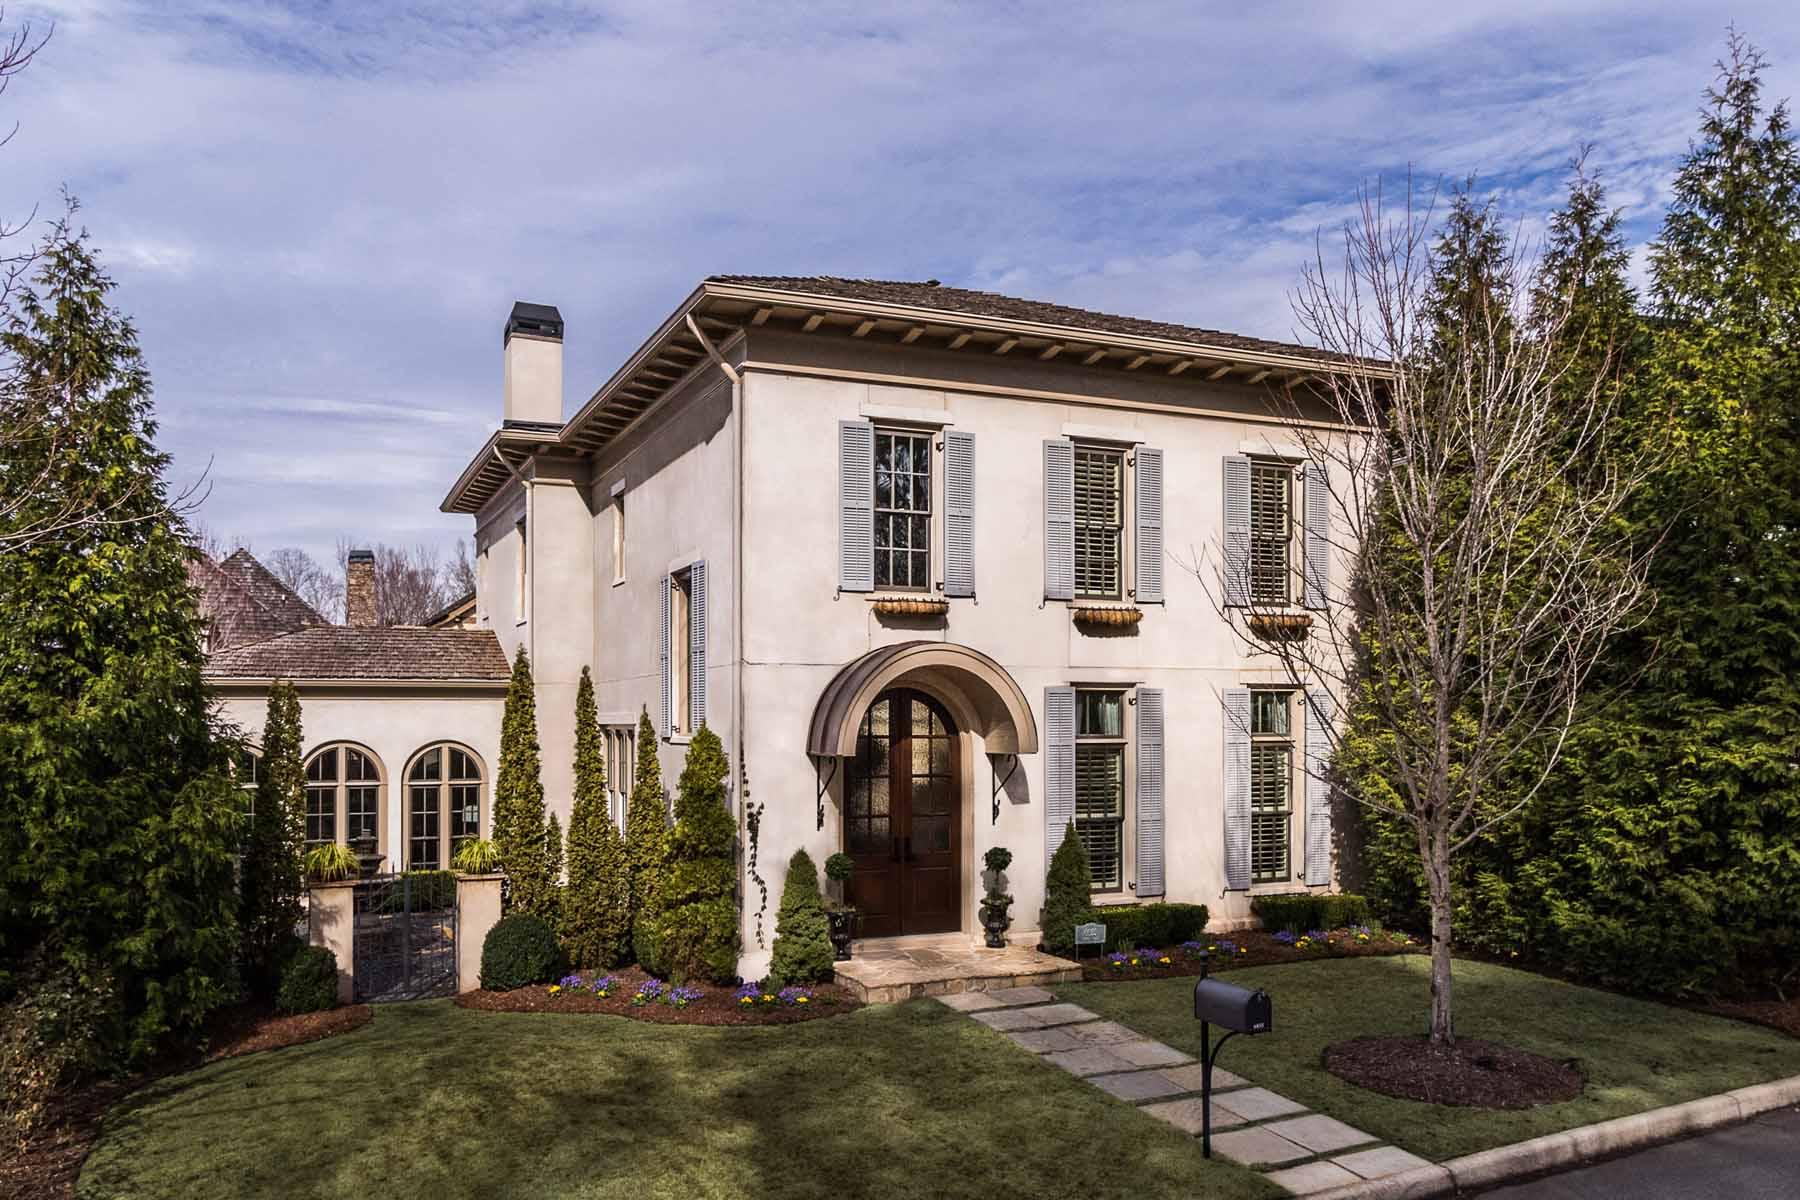 Single Family Home for Sale at Beautiful European Style Villa in Vickery 6835 Bucks Road Cumming, Georgia, 30040 United States